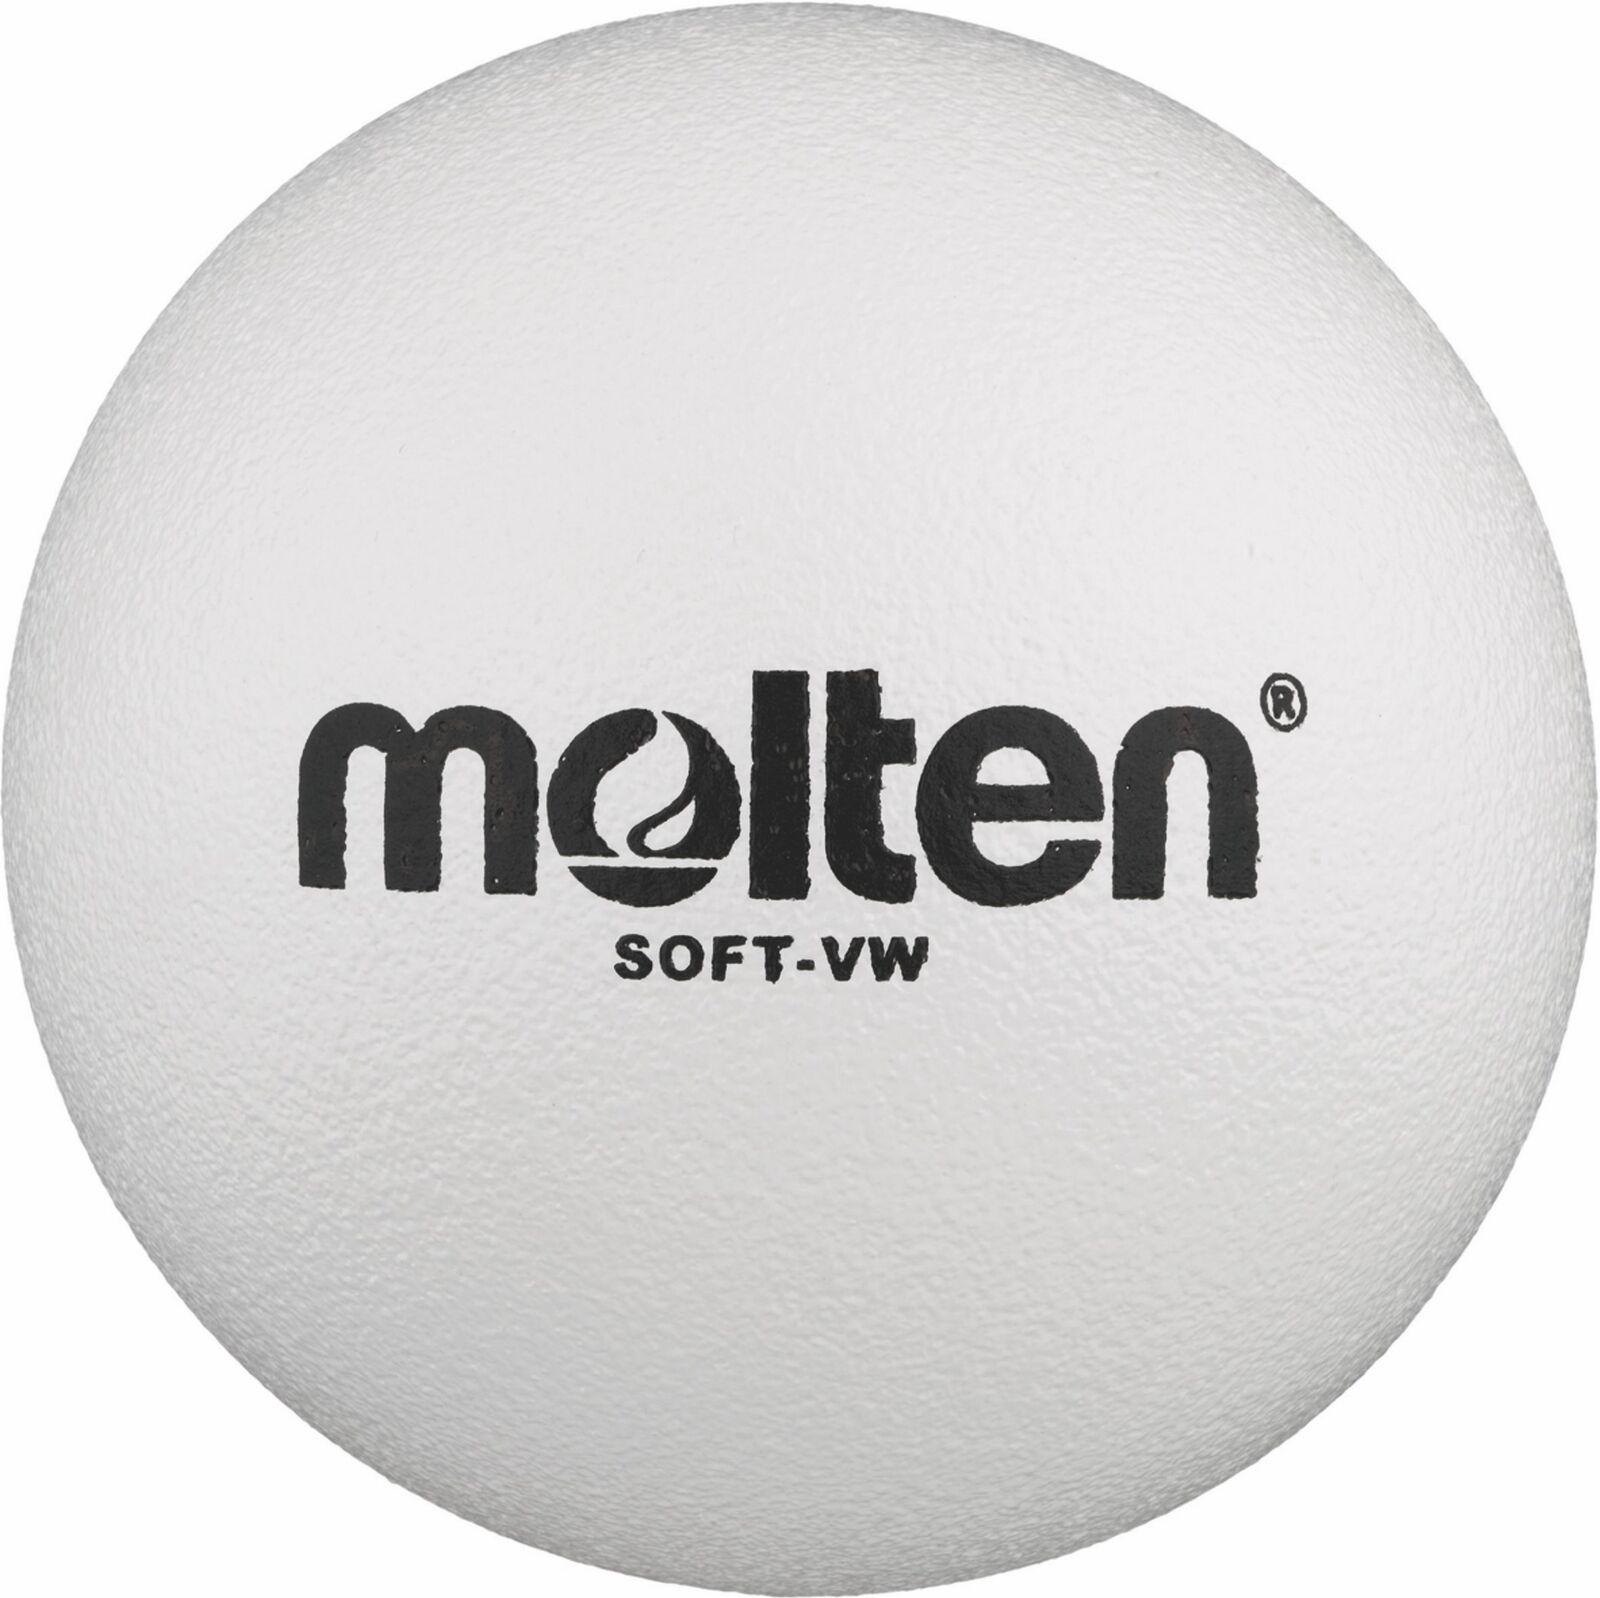 Molten Schaumstoffball Volleyball Softball Schaumball Spielball für Kinder weiß